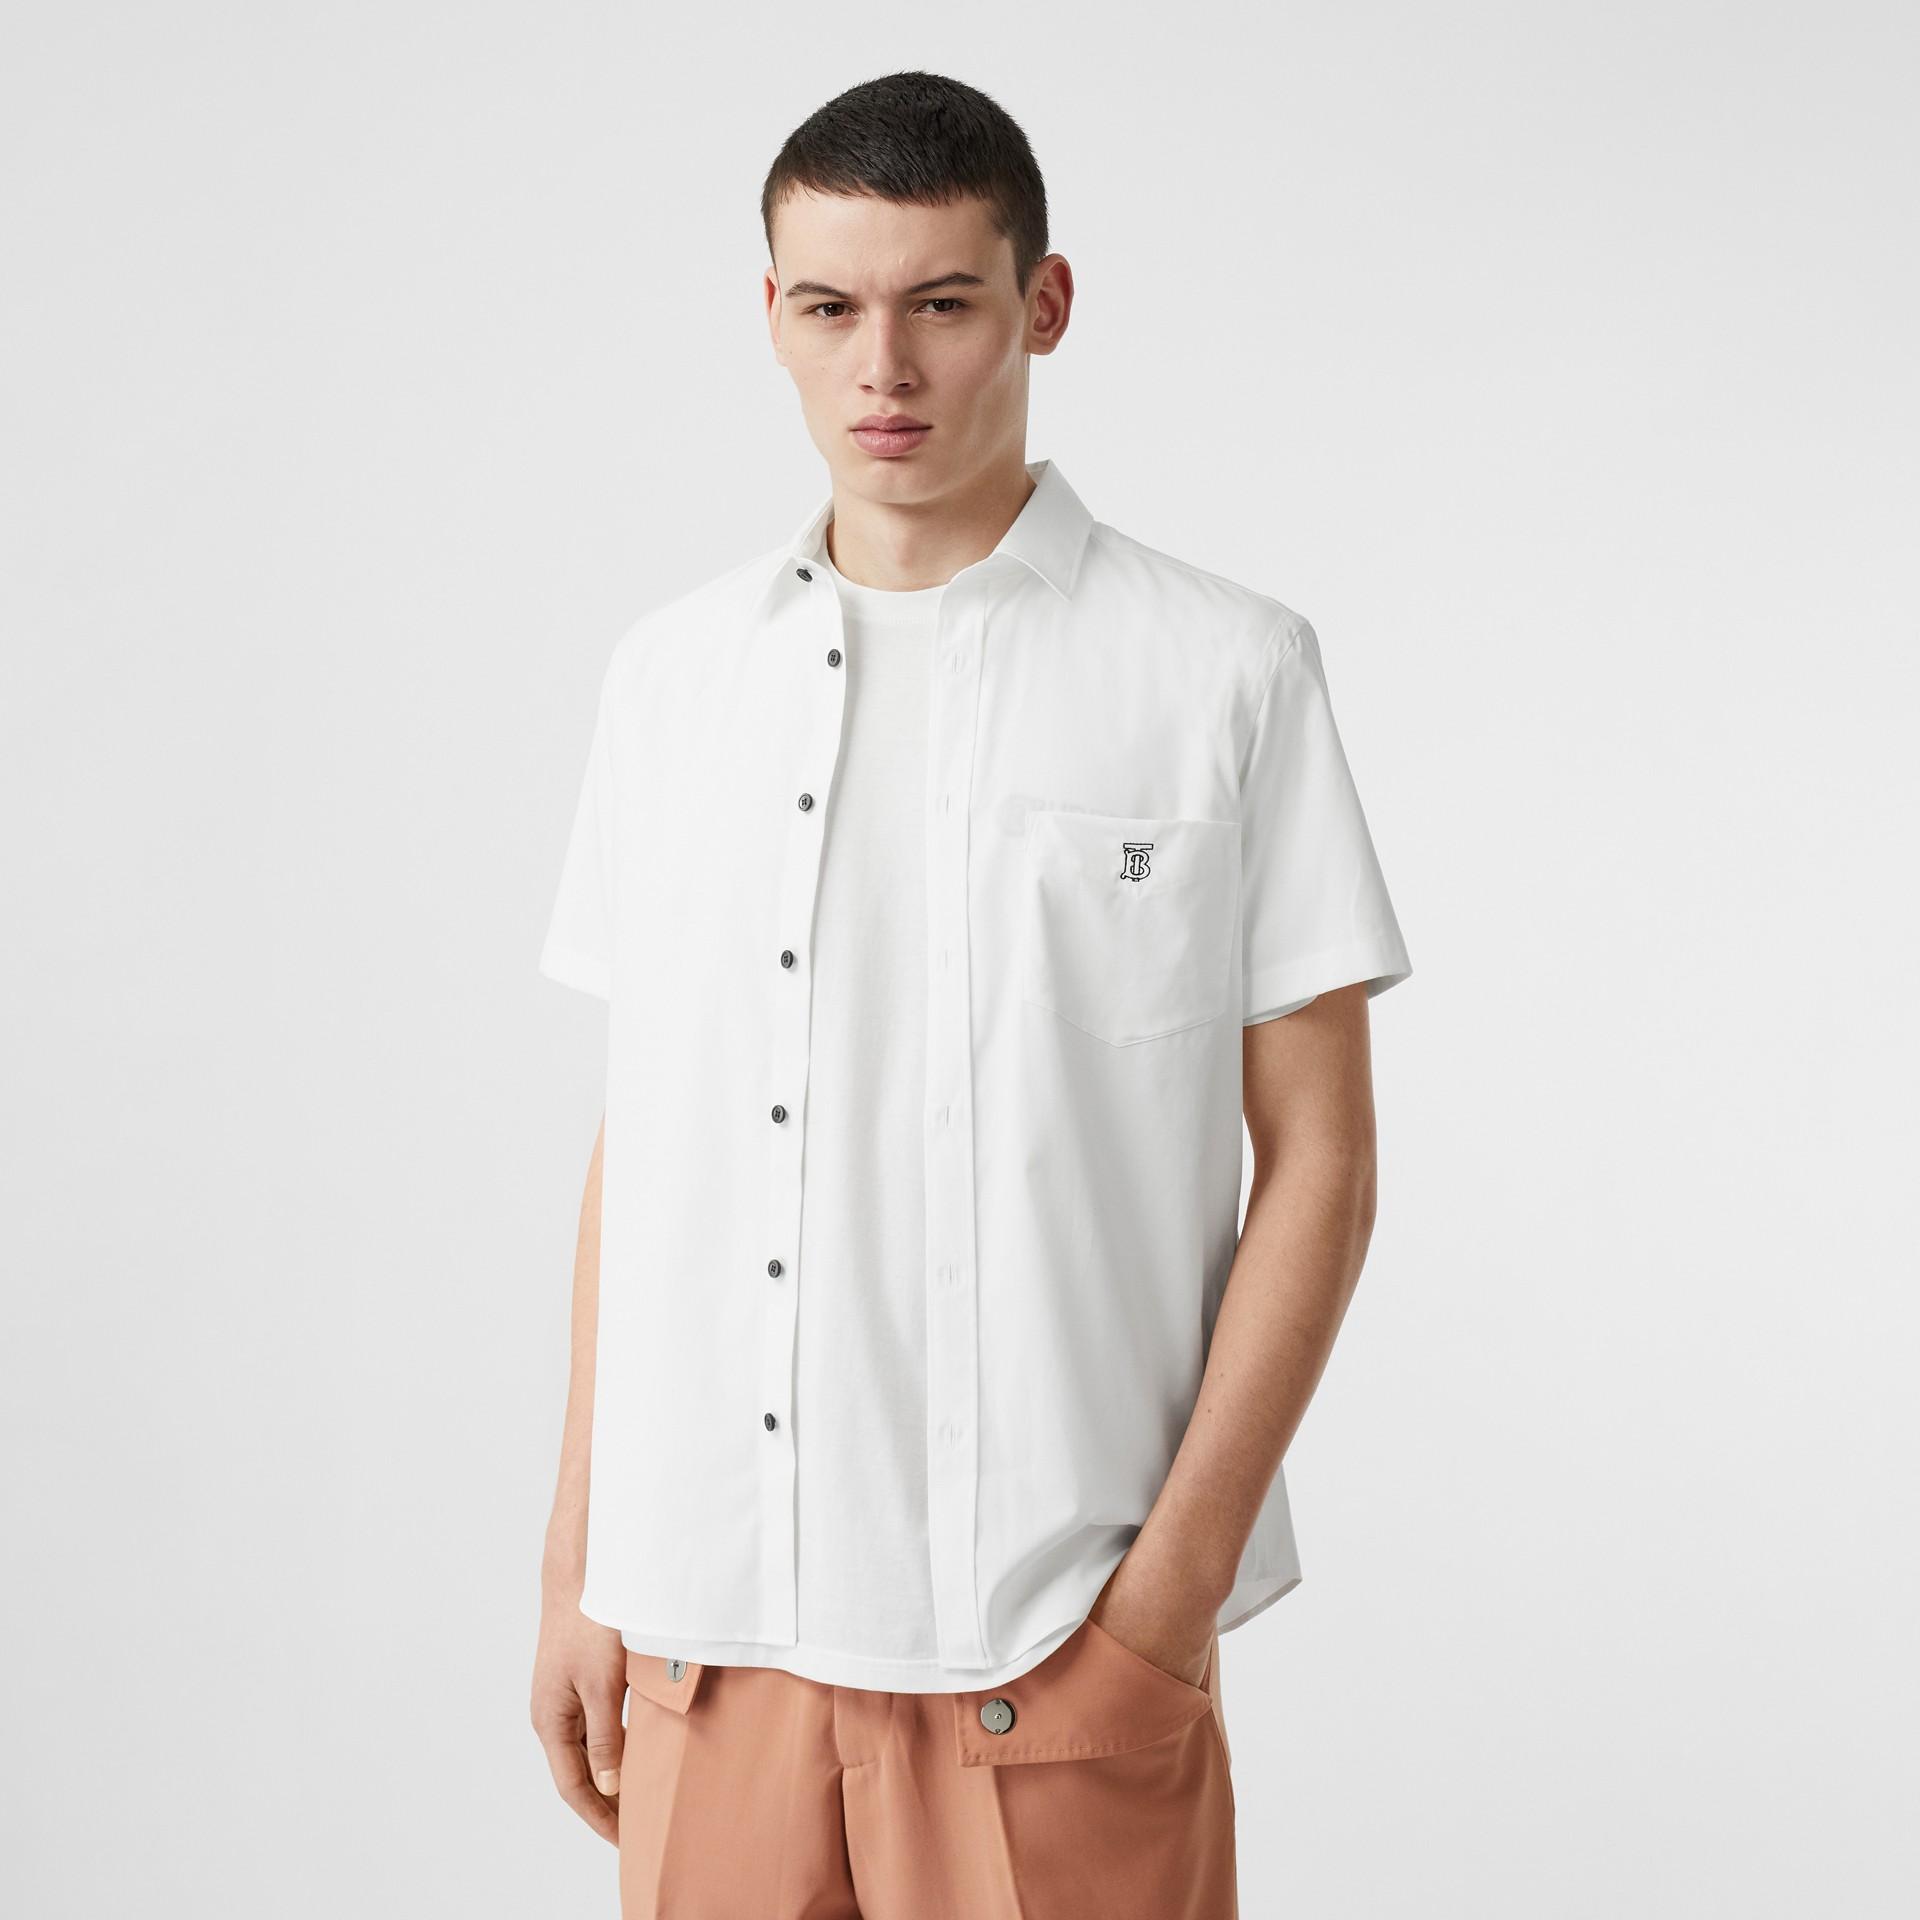 Monogram Motif Stretch Cotton Poplin Shirt in White - Men | Burberry - gallery image 4